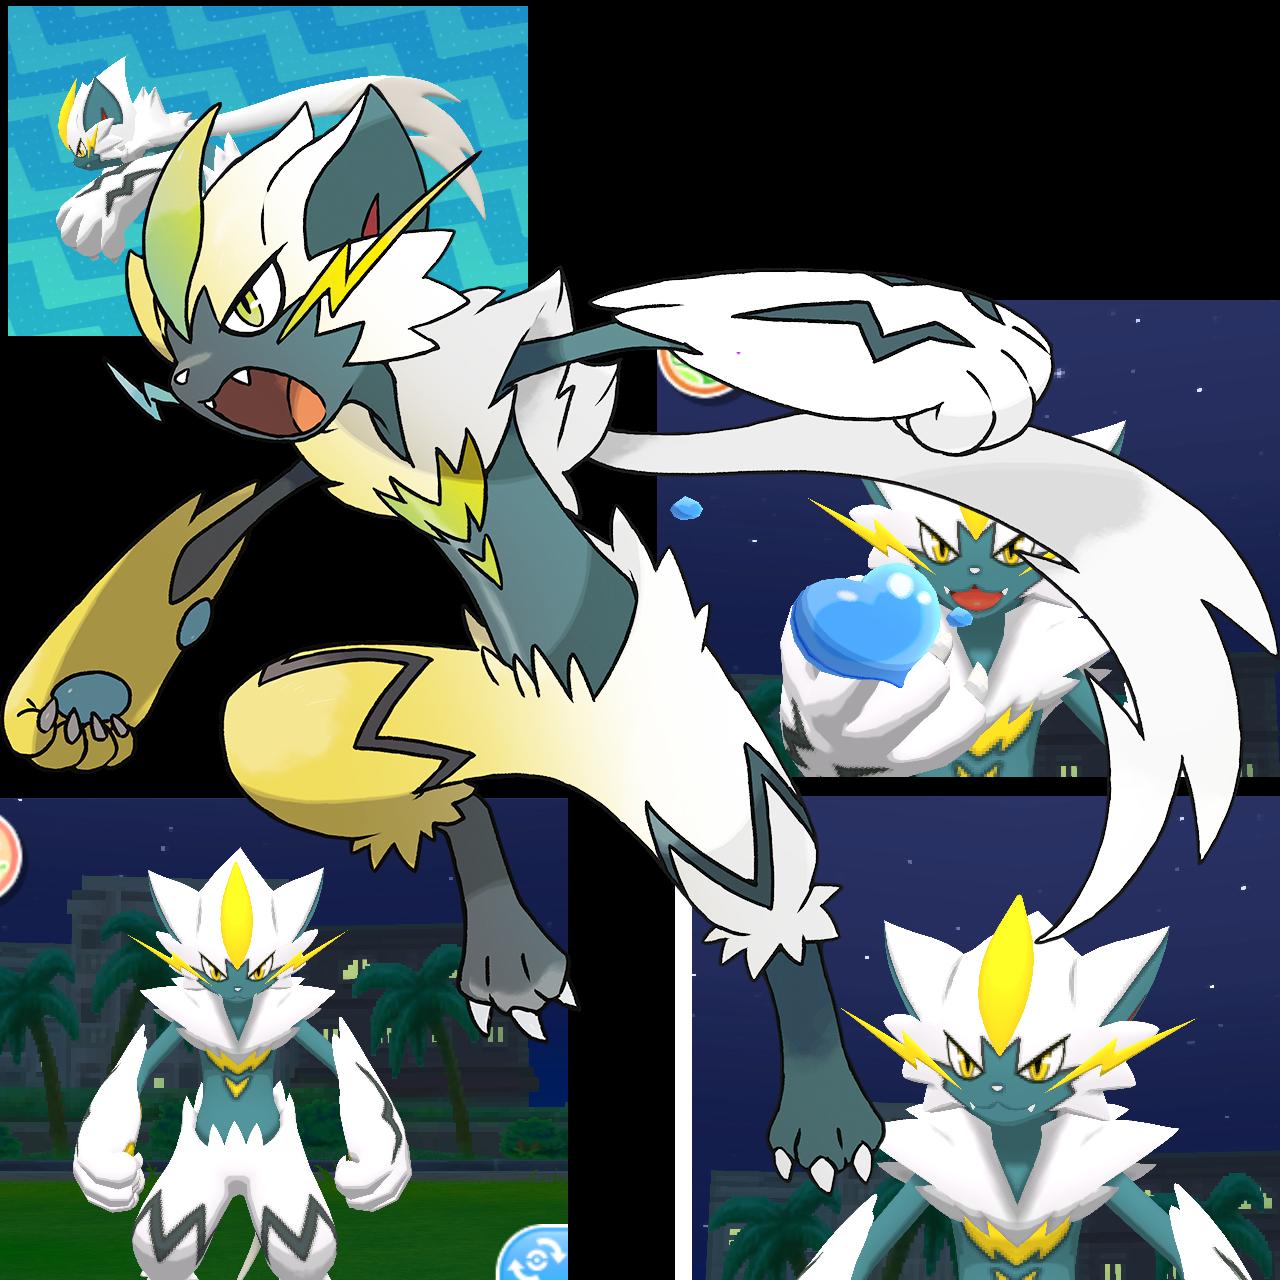 Shiny/Non-shiny Hybrid of Zeraora